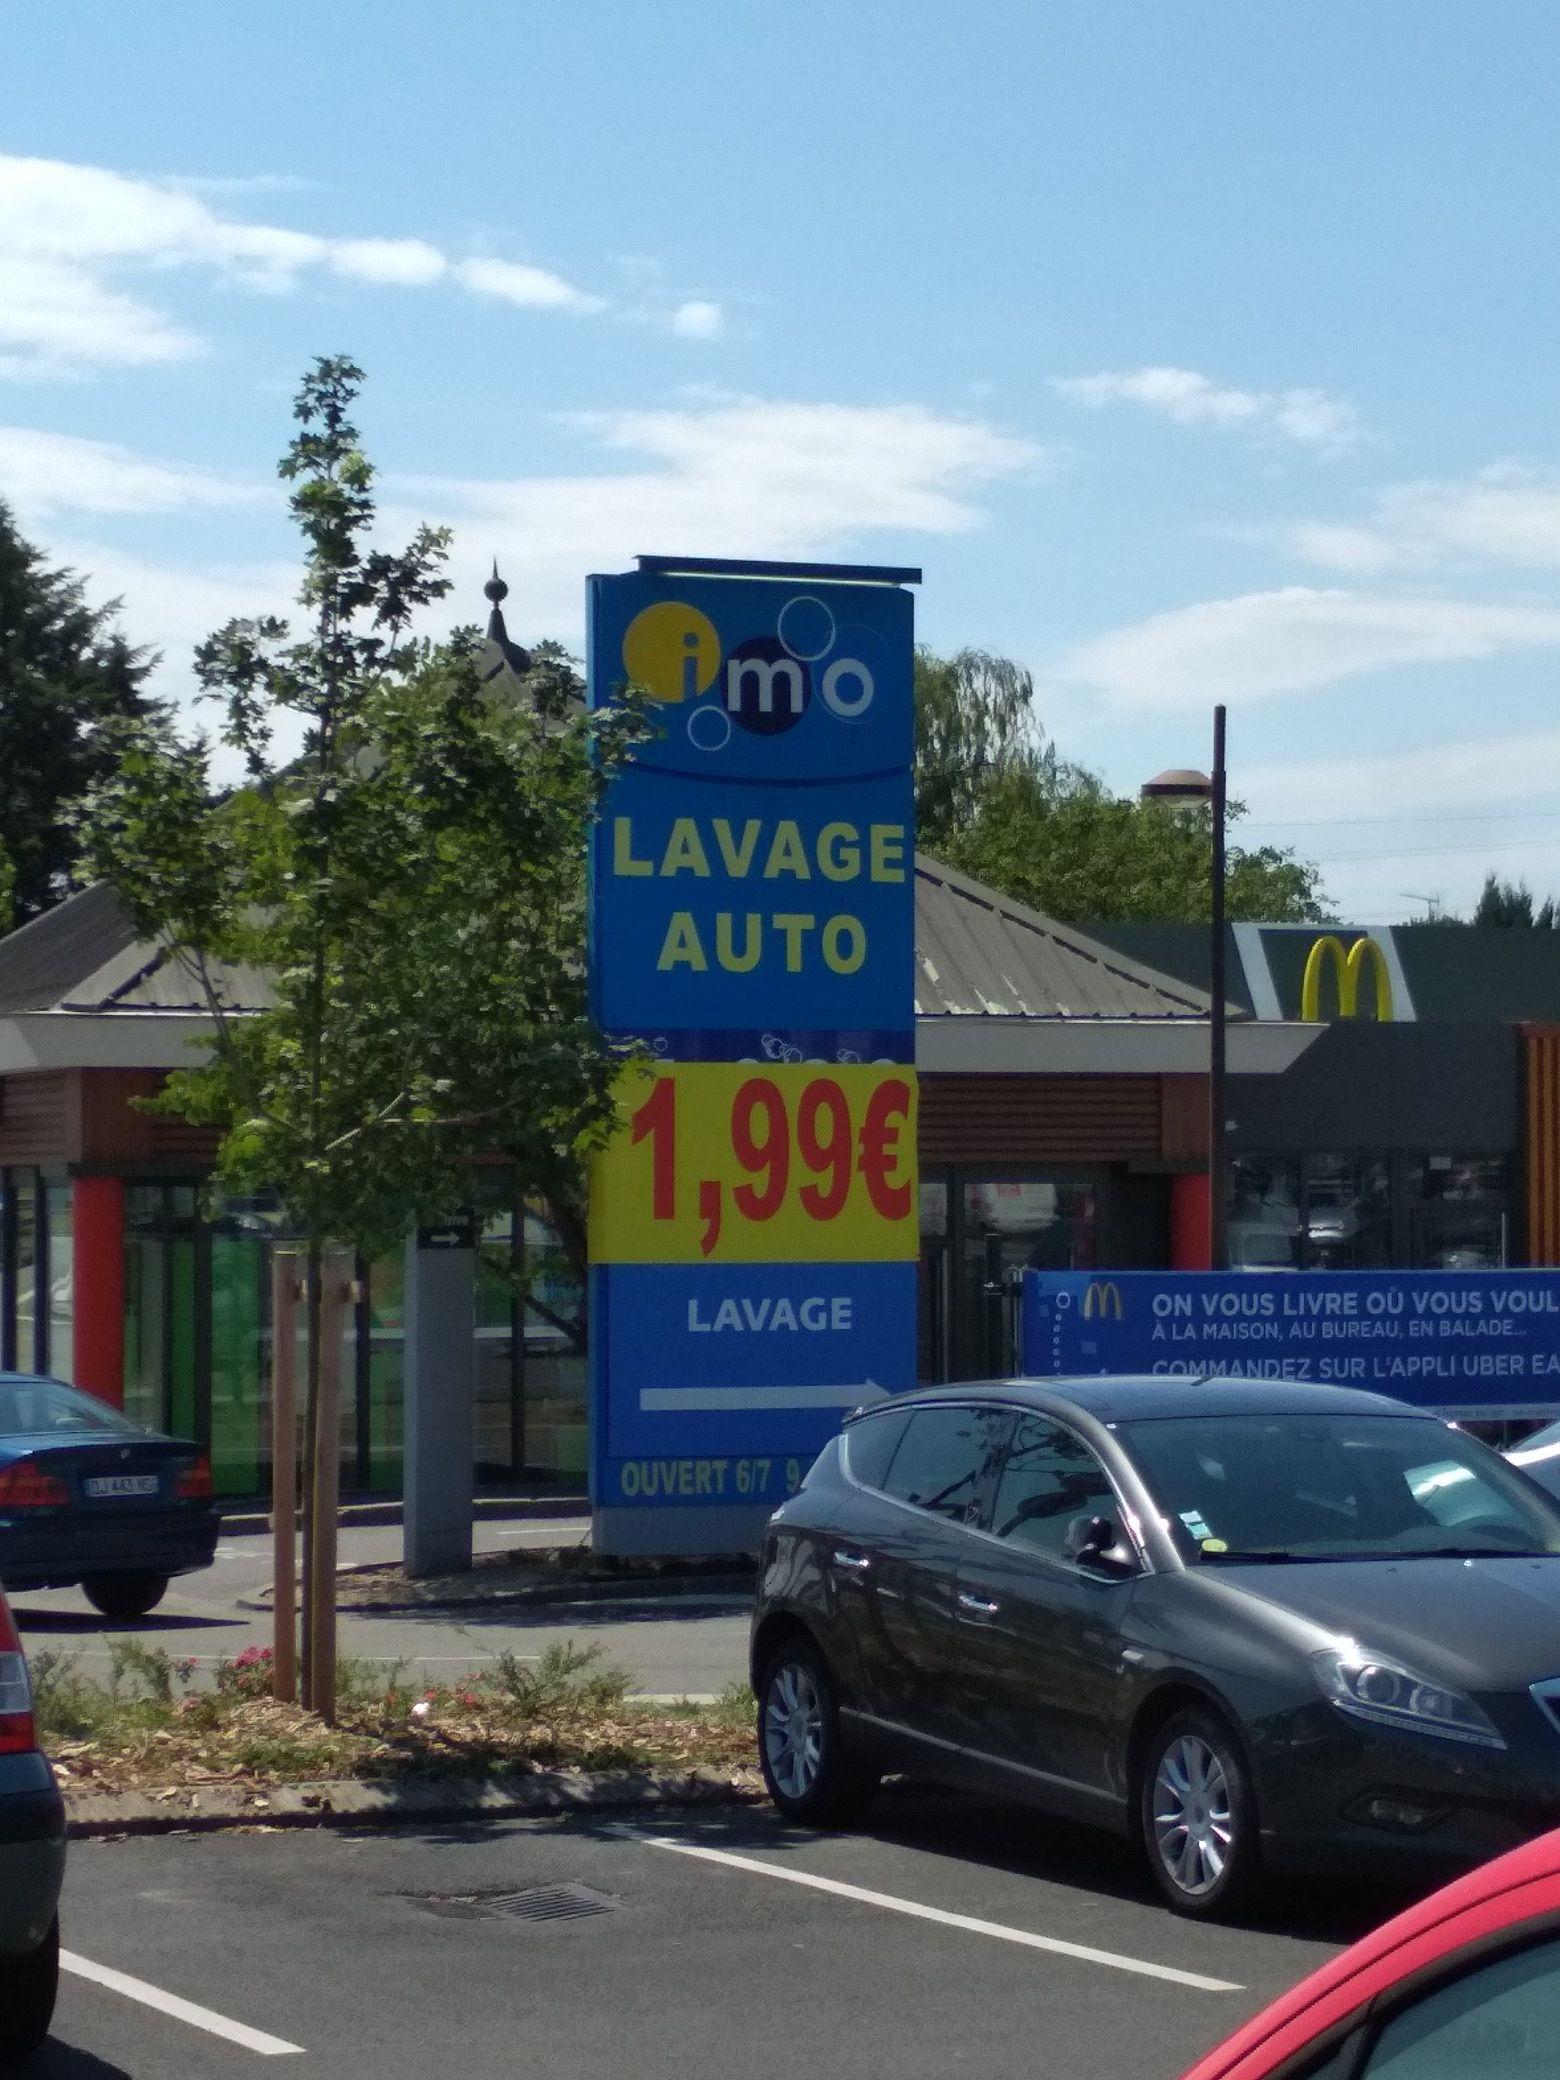 Nettoyage Autotomobile - à IMO Car Wash (Yvelines 78)